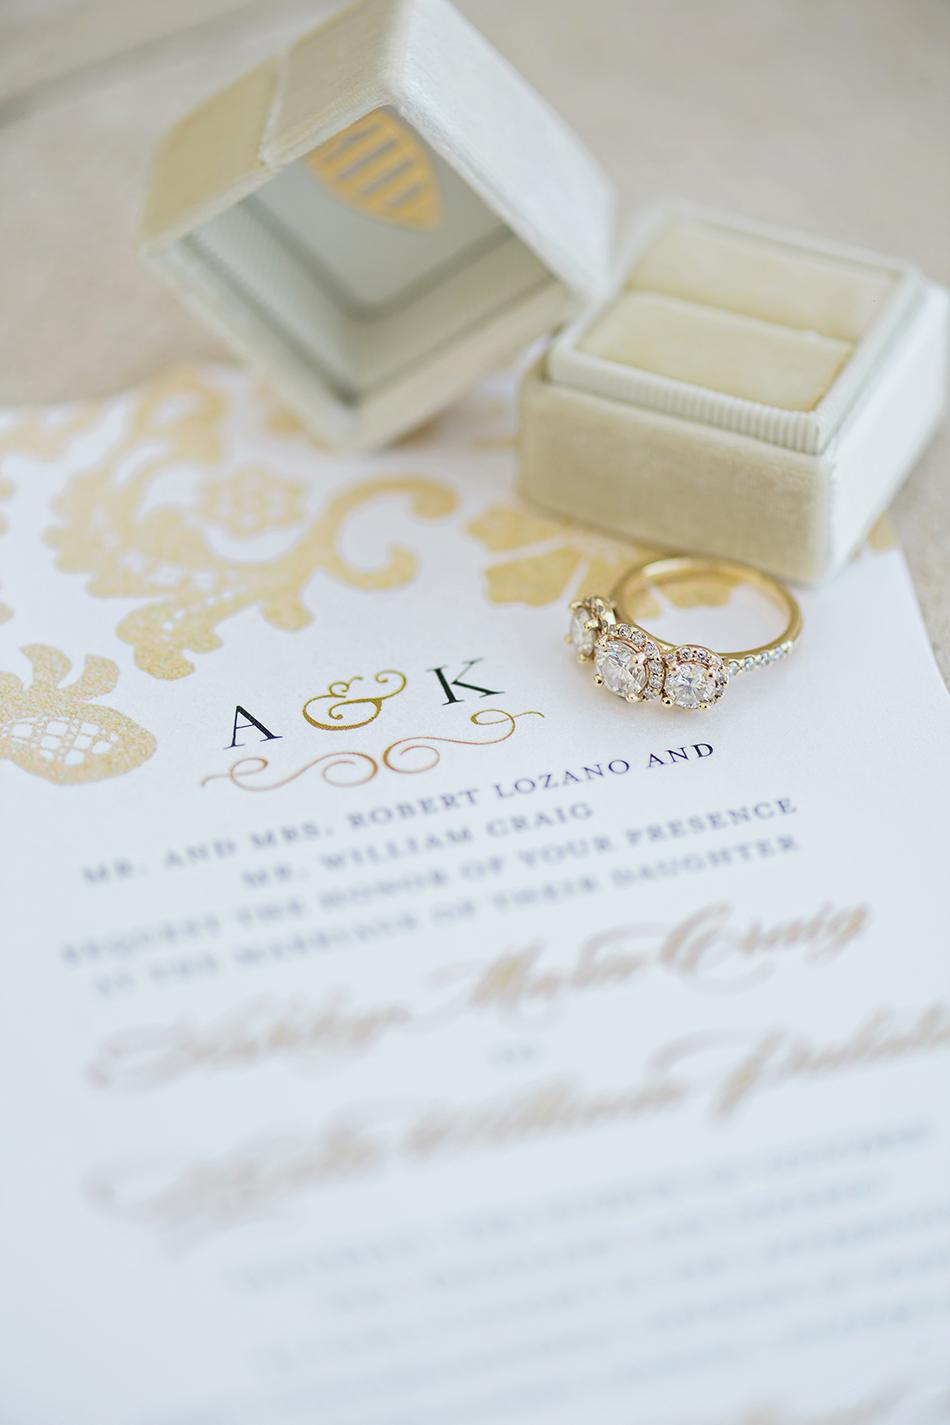 Gold monogrammed wedding invitation